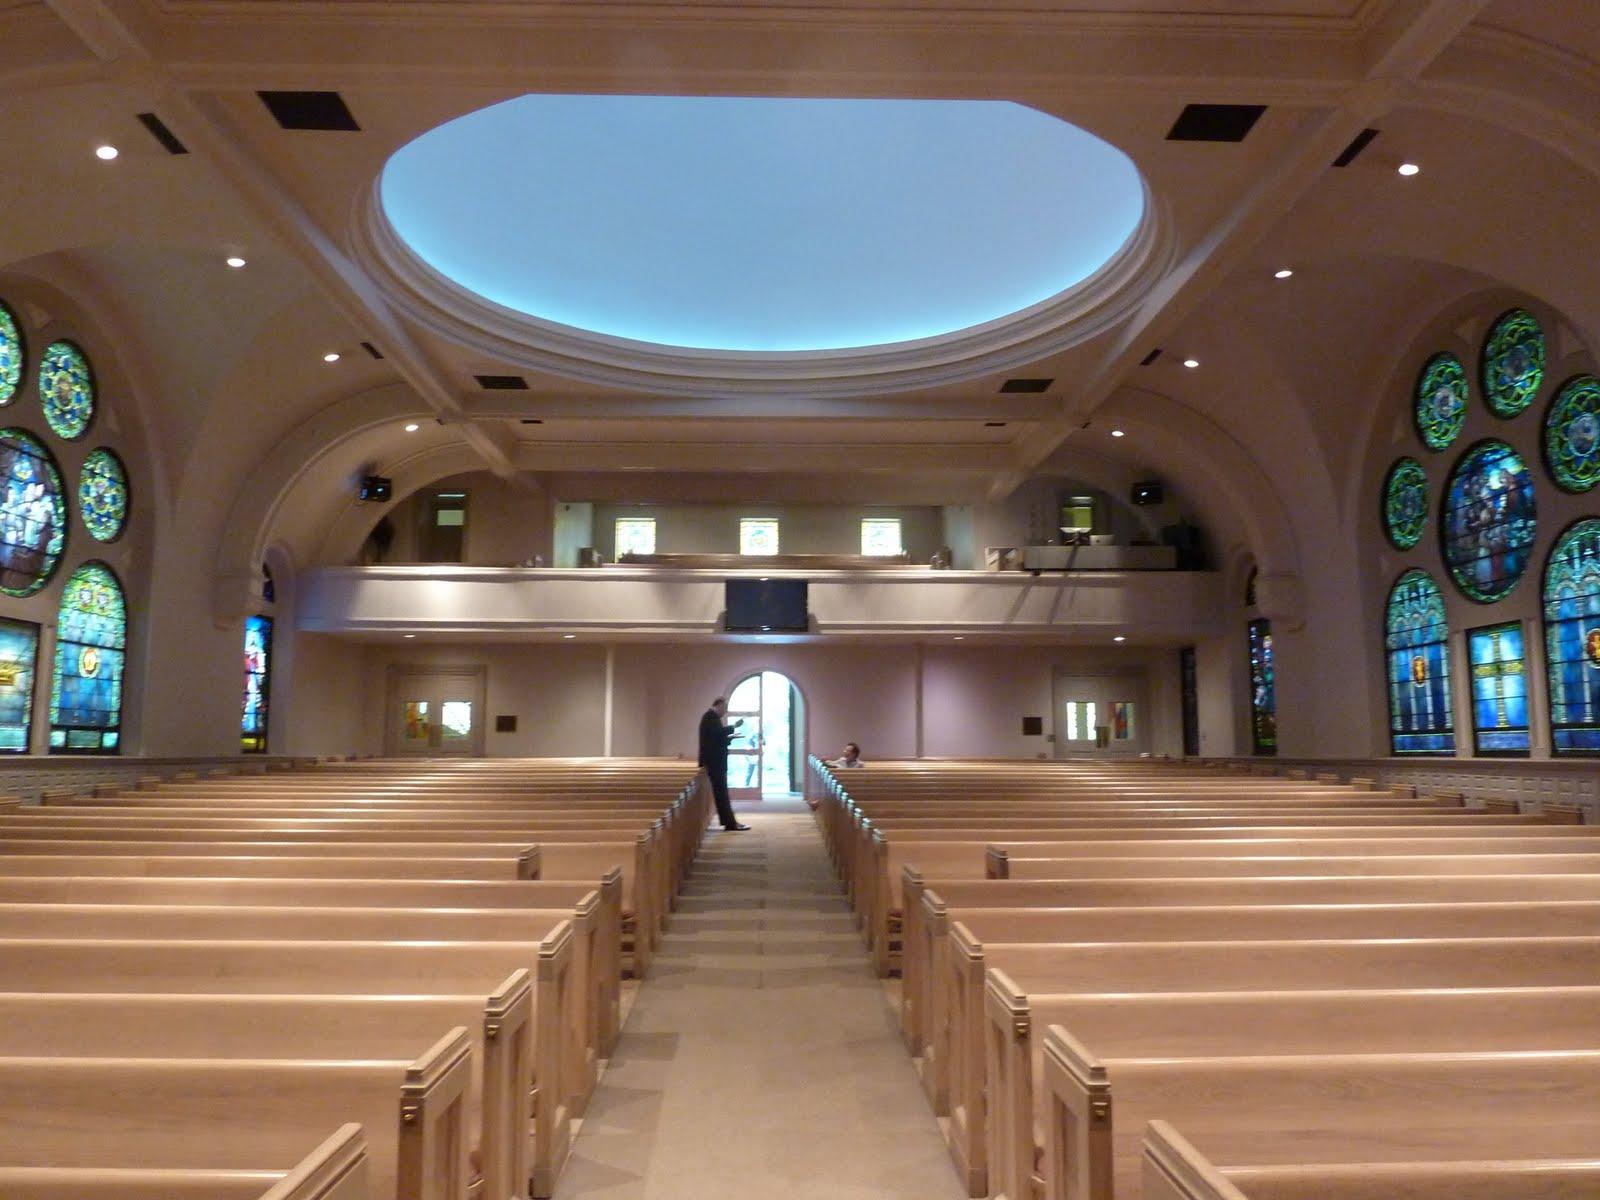 Architecture Tourist: My Final Stop: North Avenue Presbyterian ...